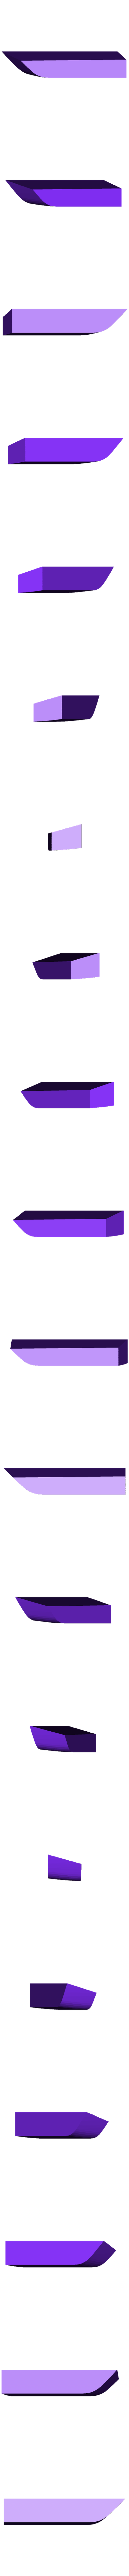 Light 2.stl Download free STL file 1989 mini Batmobile • 3D printable model, Dsk